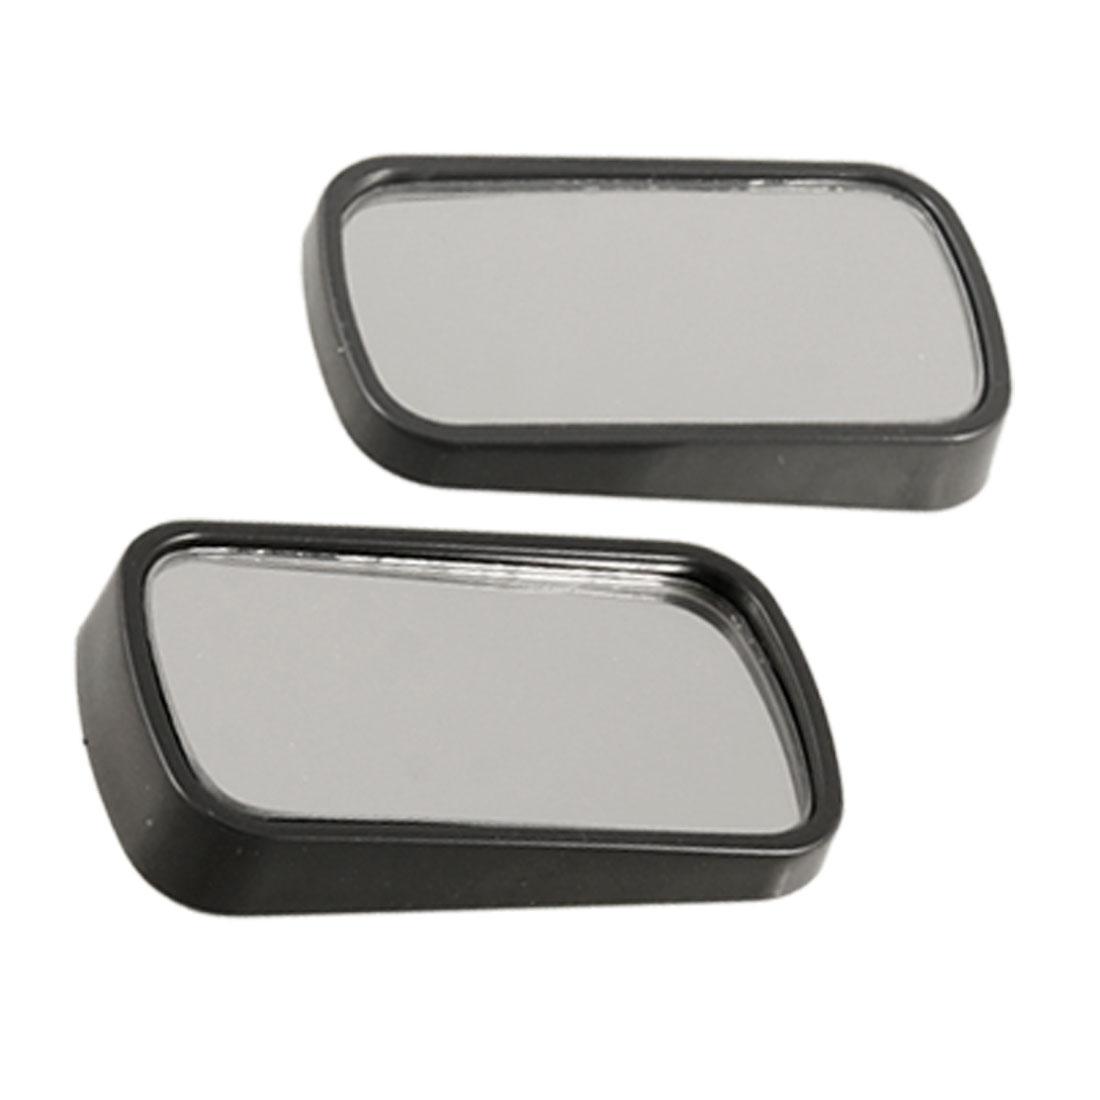 "2 Pcs Car Vehicle Adhesive Rear View Blind Spot Mirror 2.5"" x 1.5"""